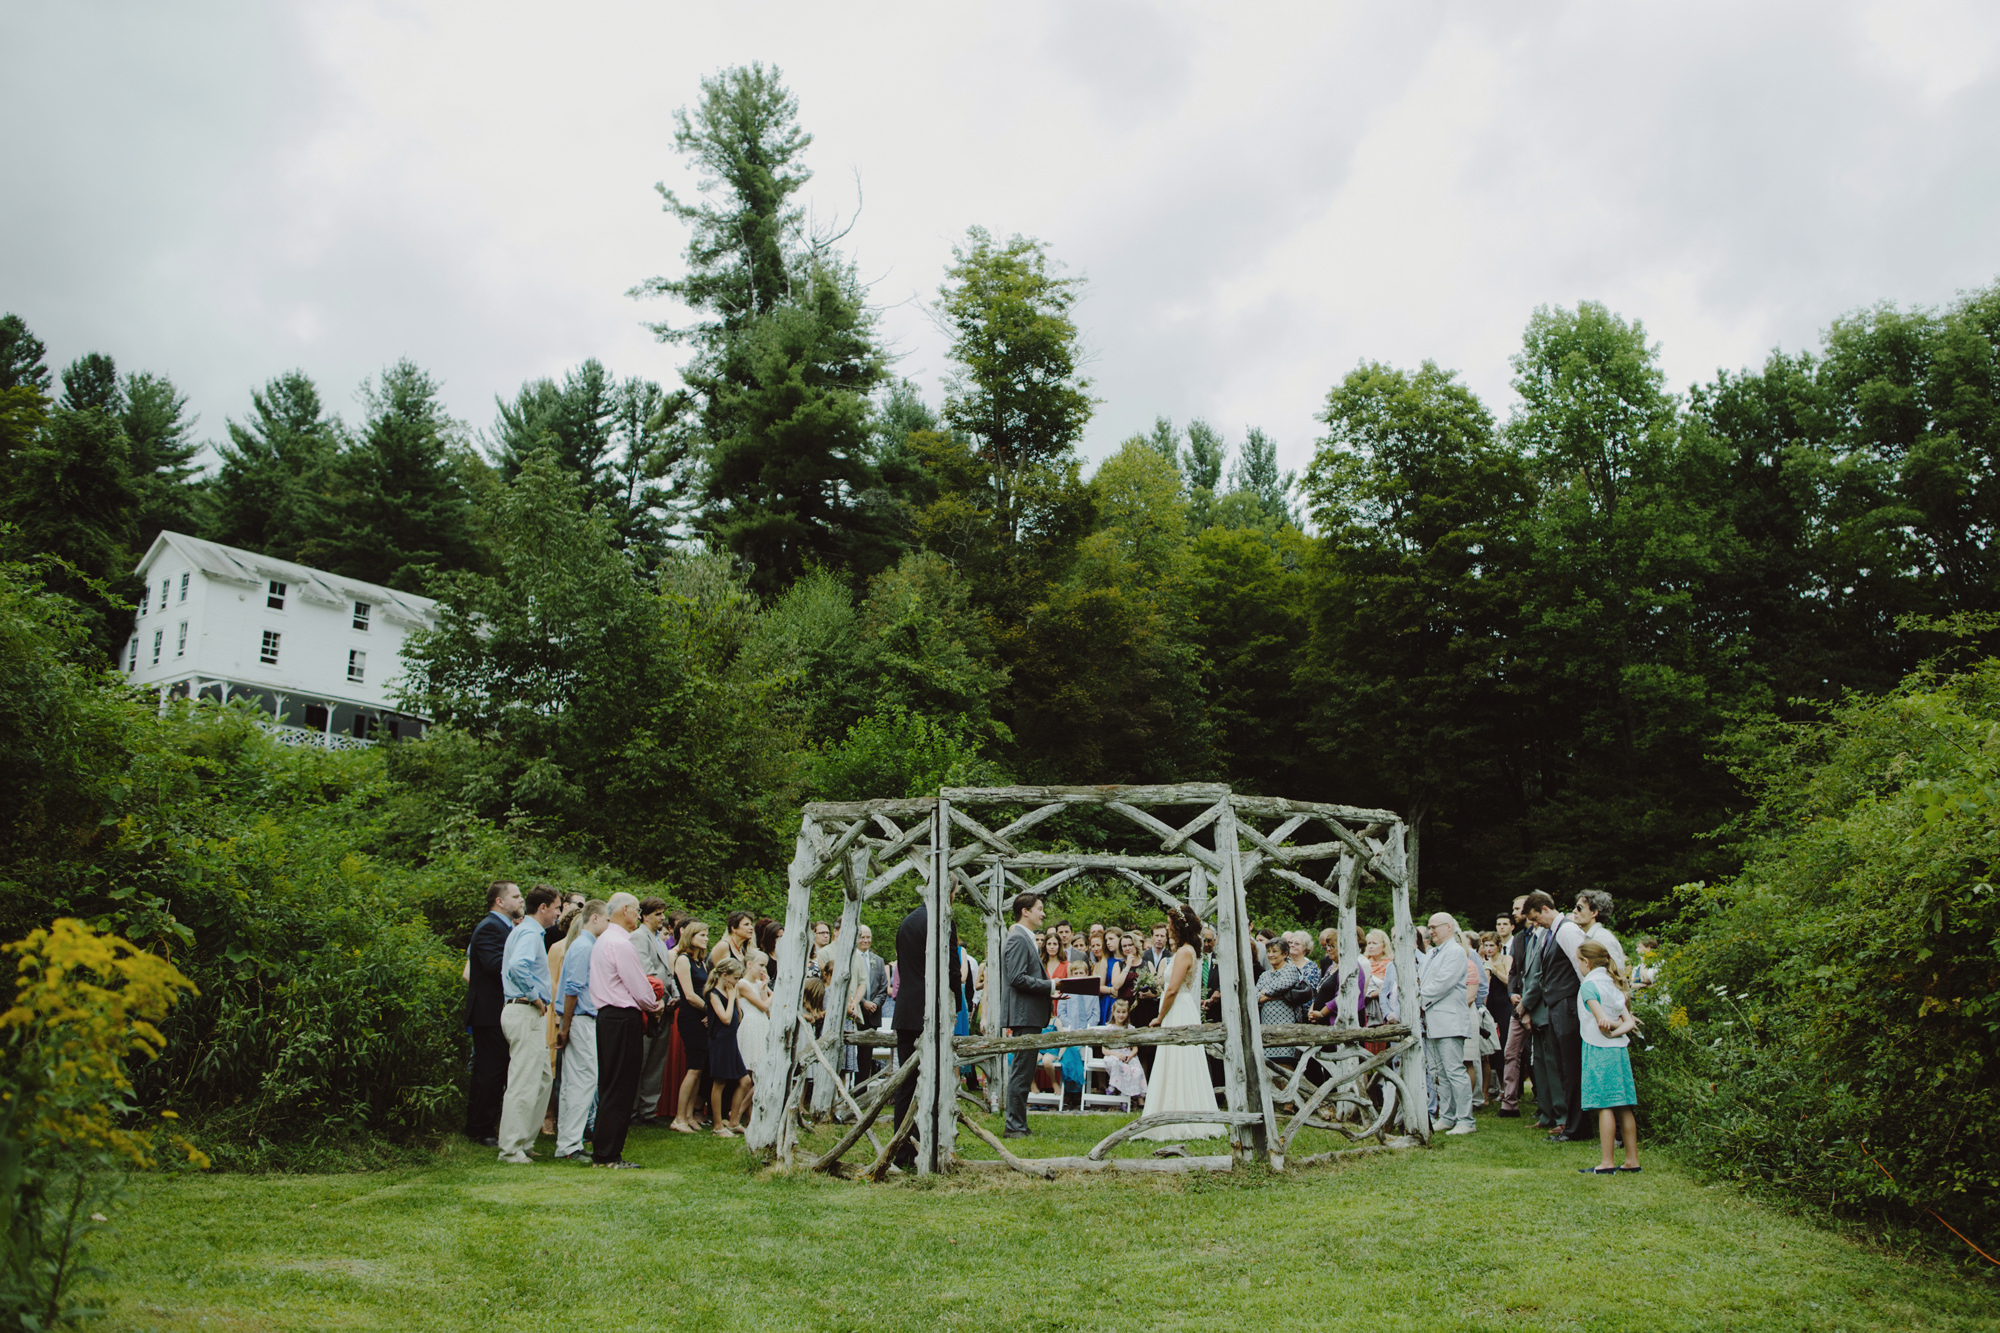 catskills_big_indian_springs_upstate_NY_wedding_sammblake064.jpg